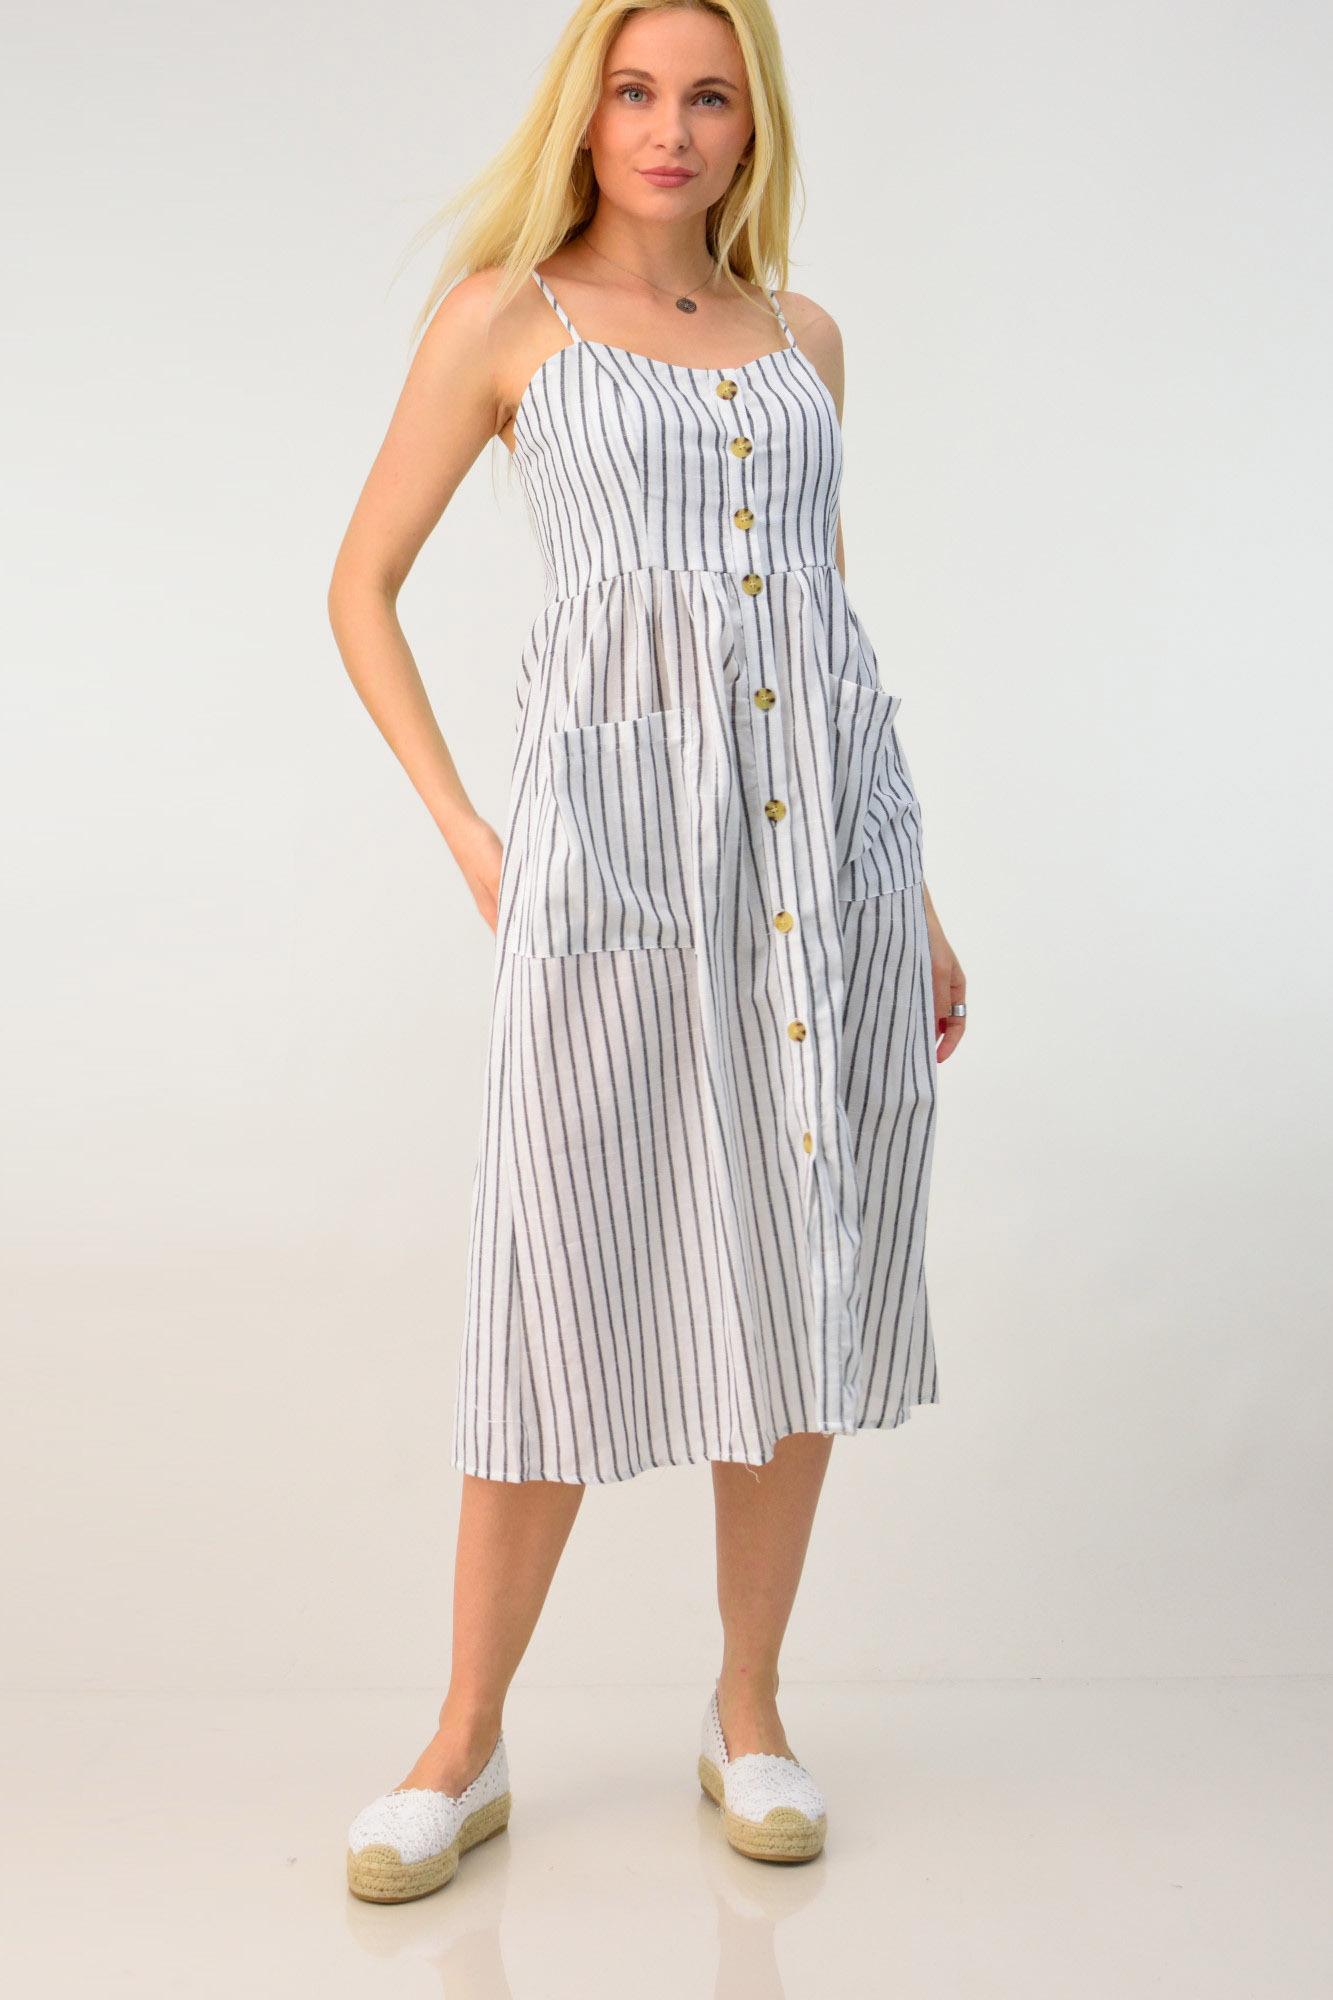 885ac6ffa245 Λινό φόρεμα midi. Tap to expand